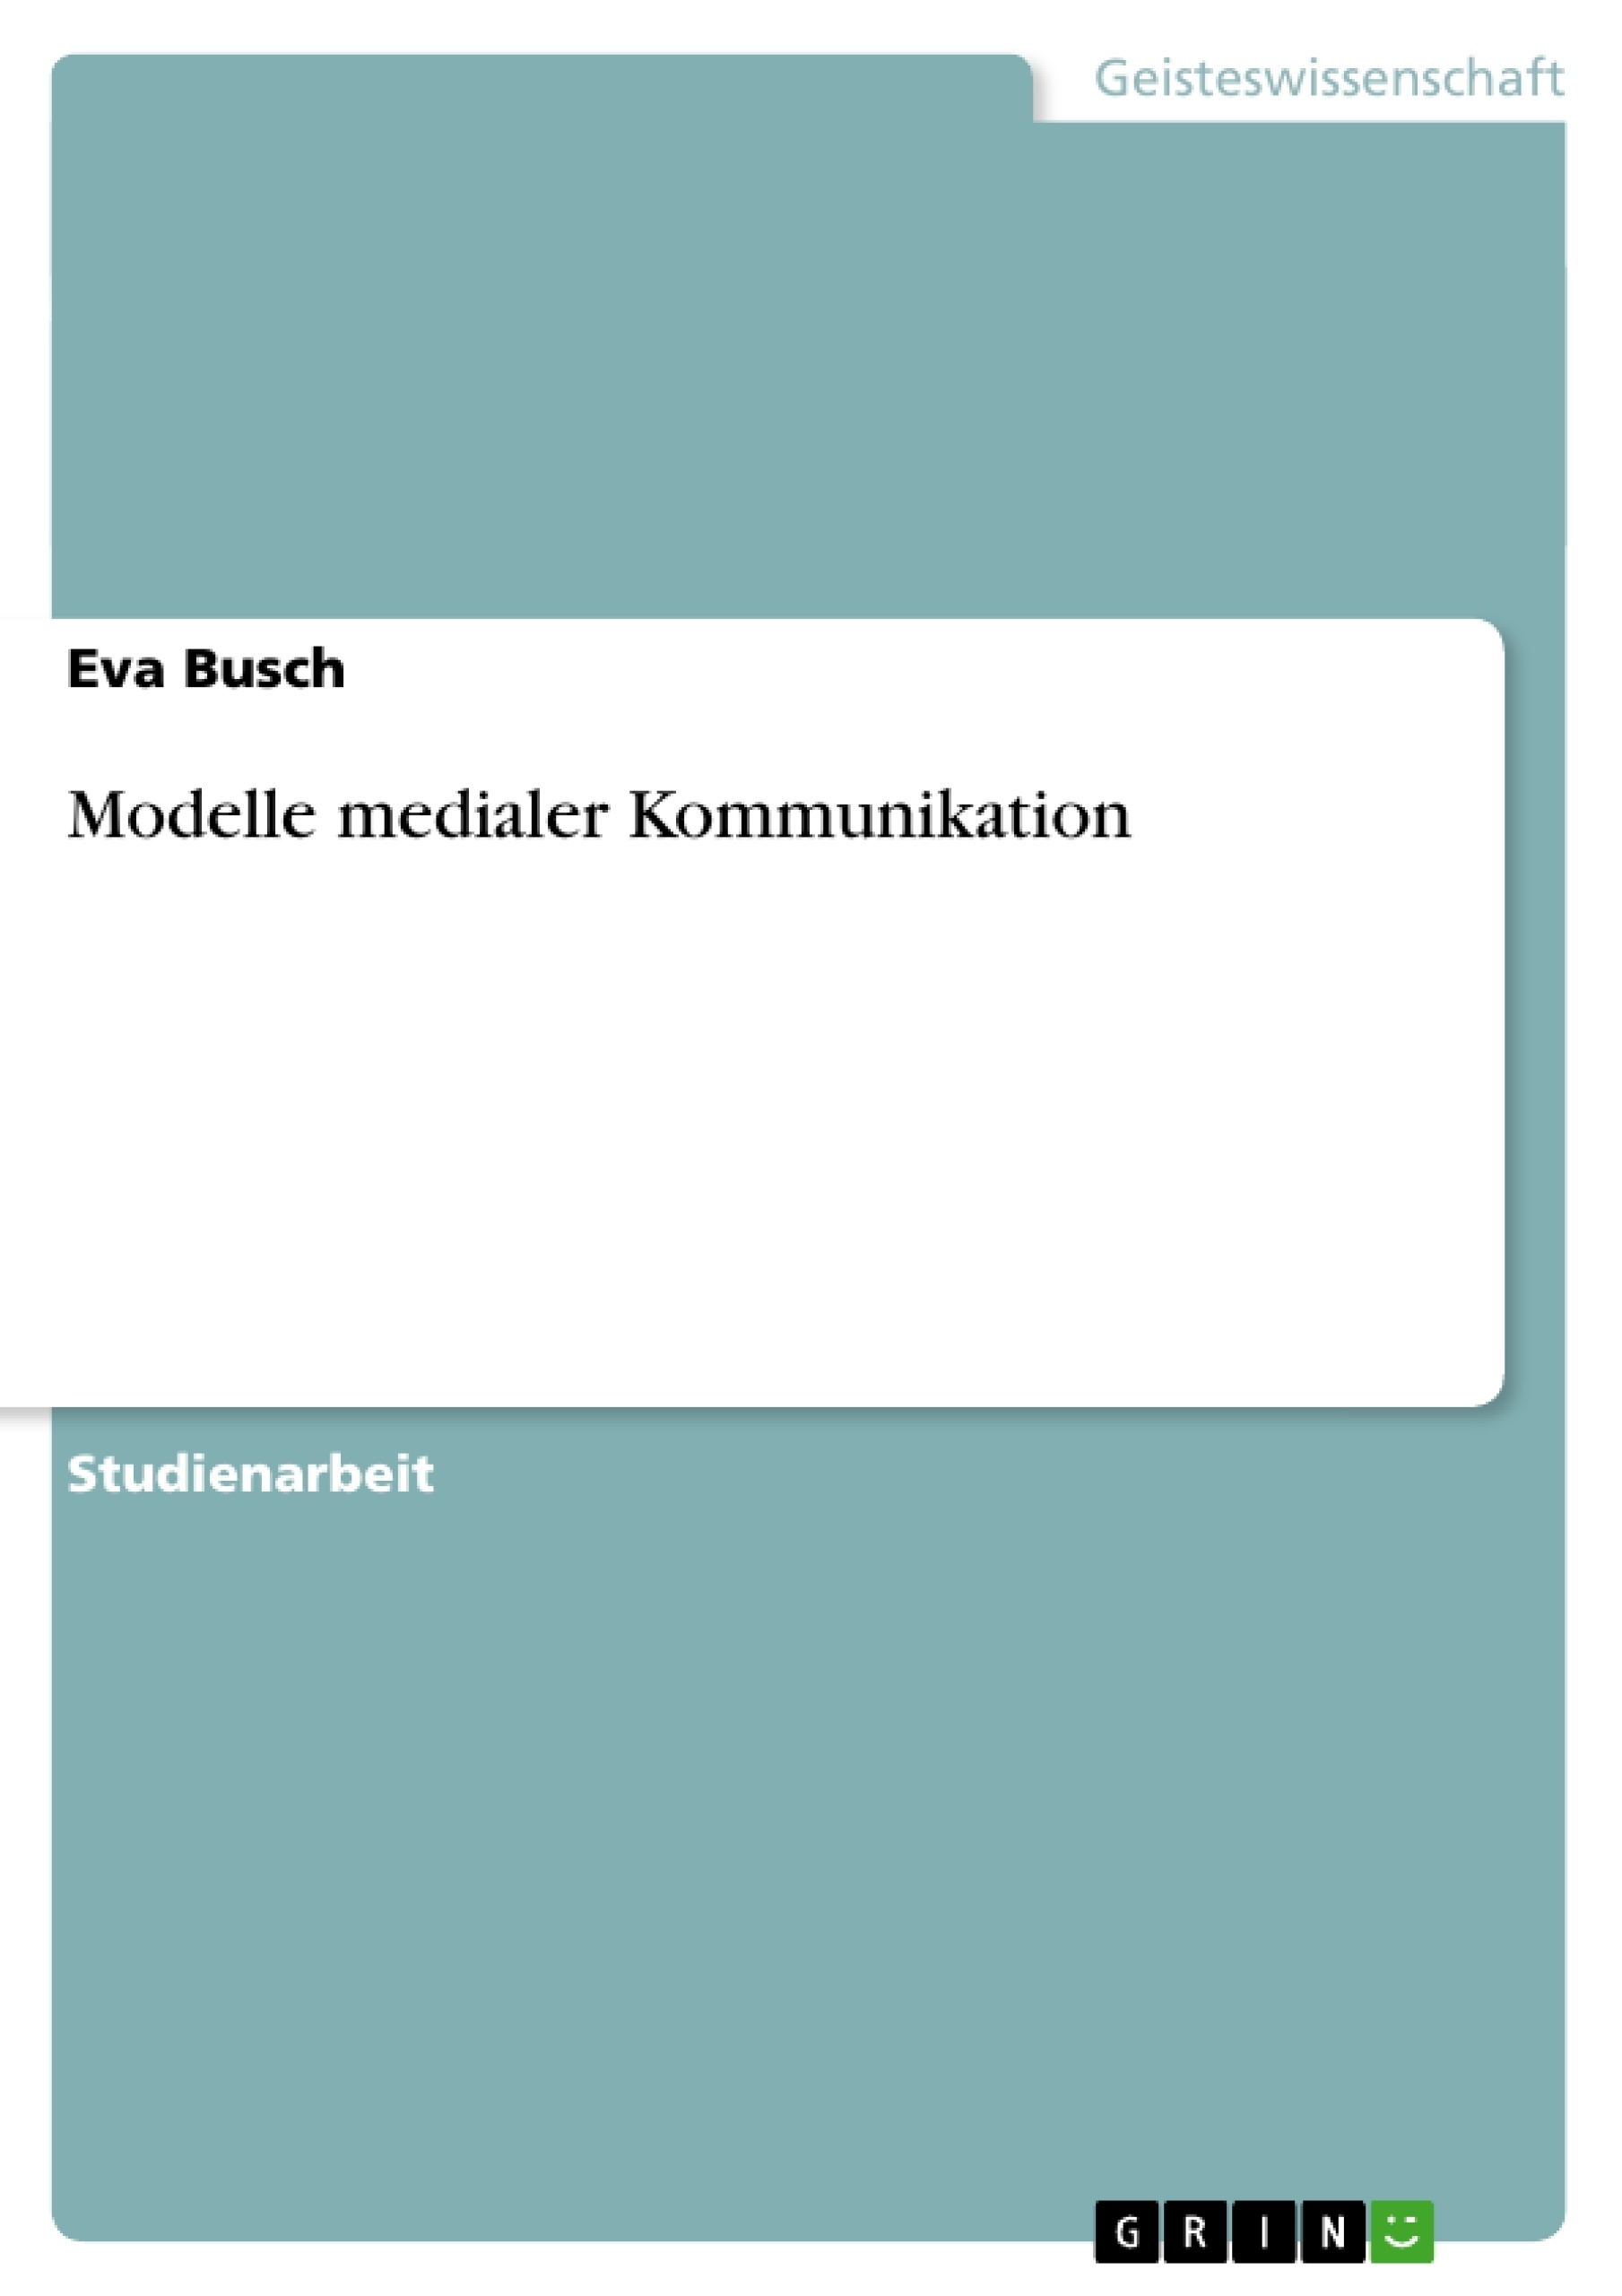 Titel: Modelle medialer Kommunikation